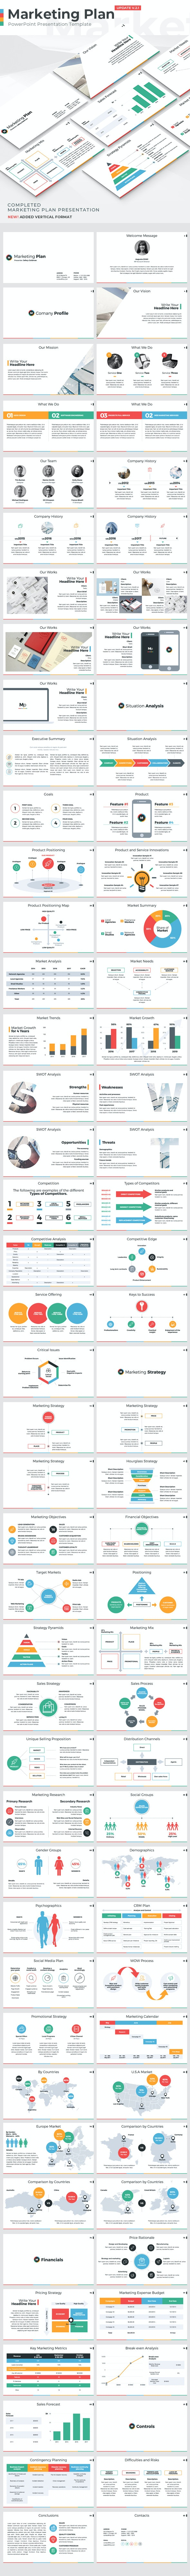 Marketing Plan - PowerPoint Presentation Template - PowerPoint Templates Presentation Templates